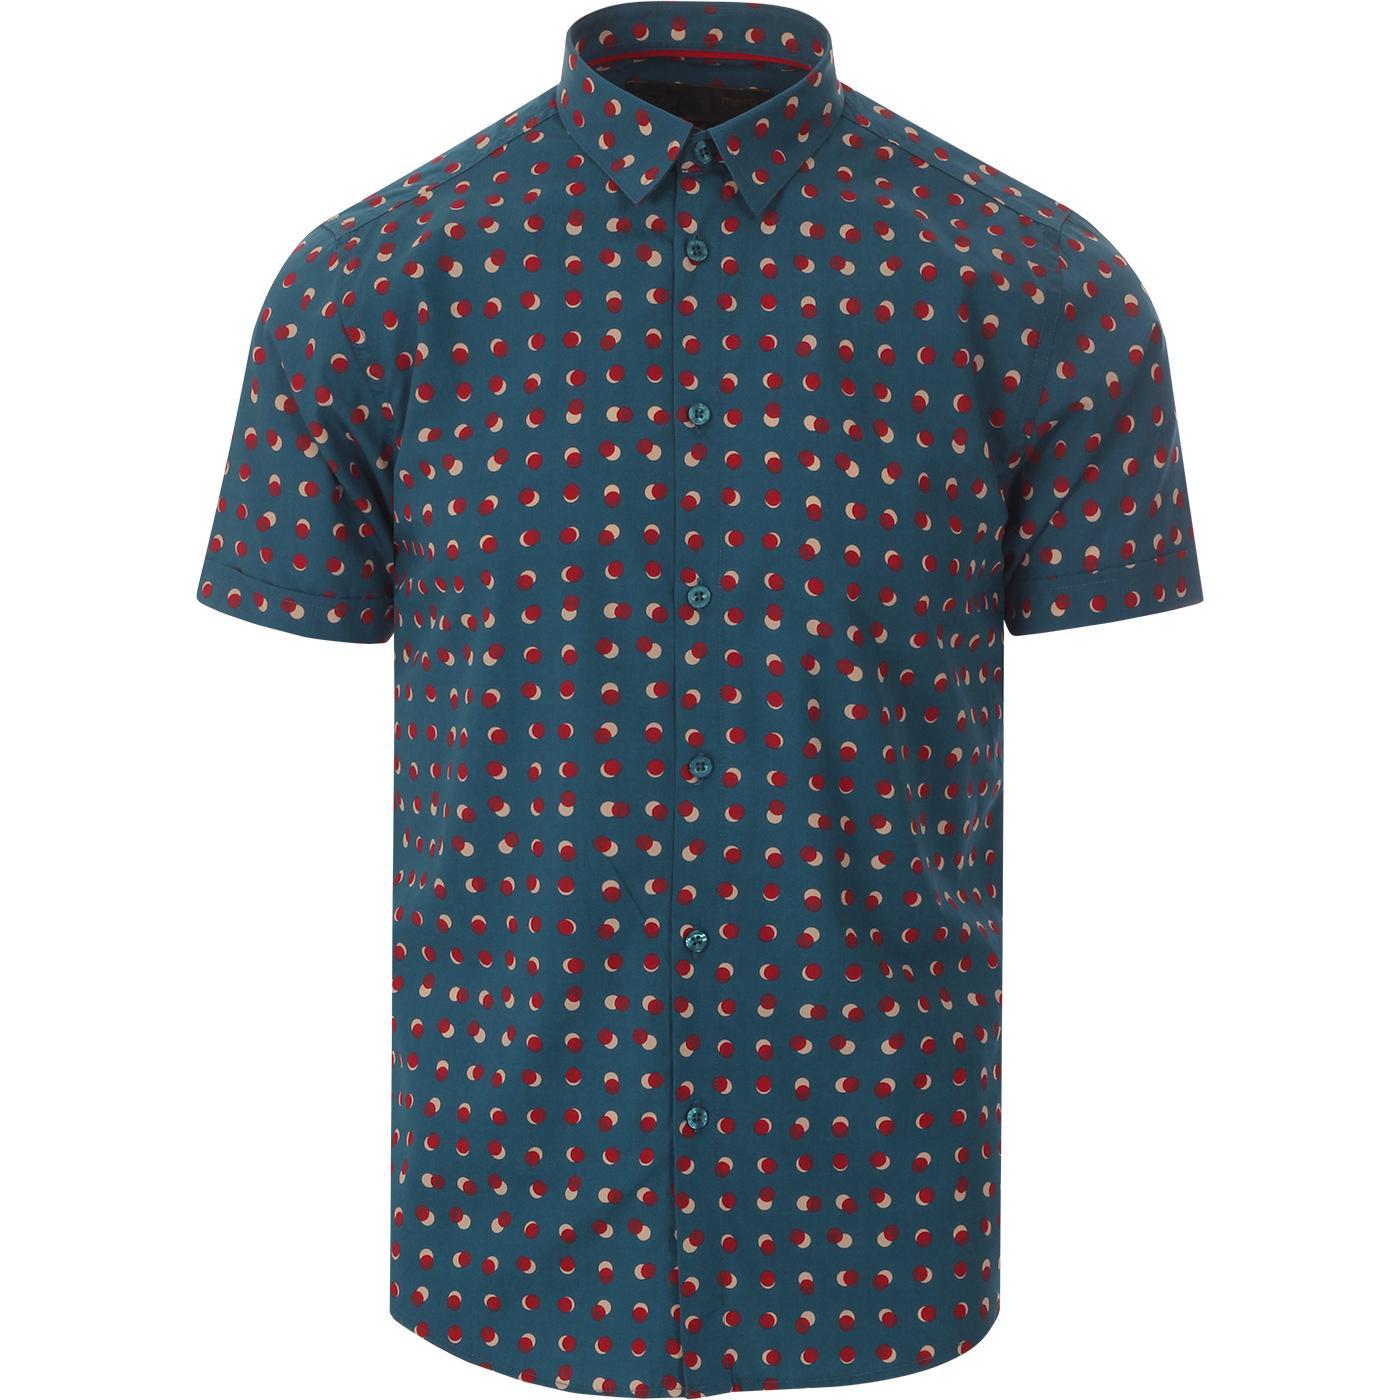 Shelley MERC 60s Mod SS Optic Polka Dot Shirt (BB)